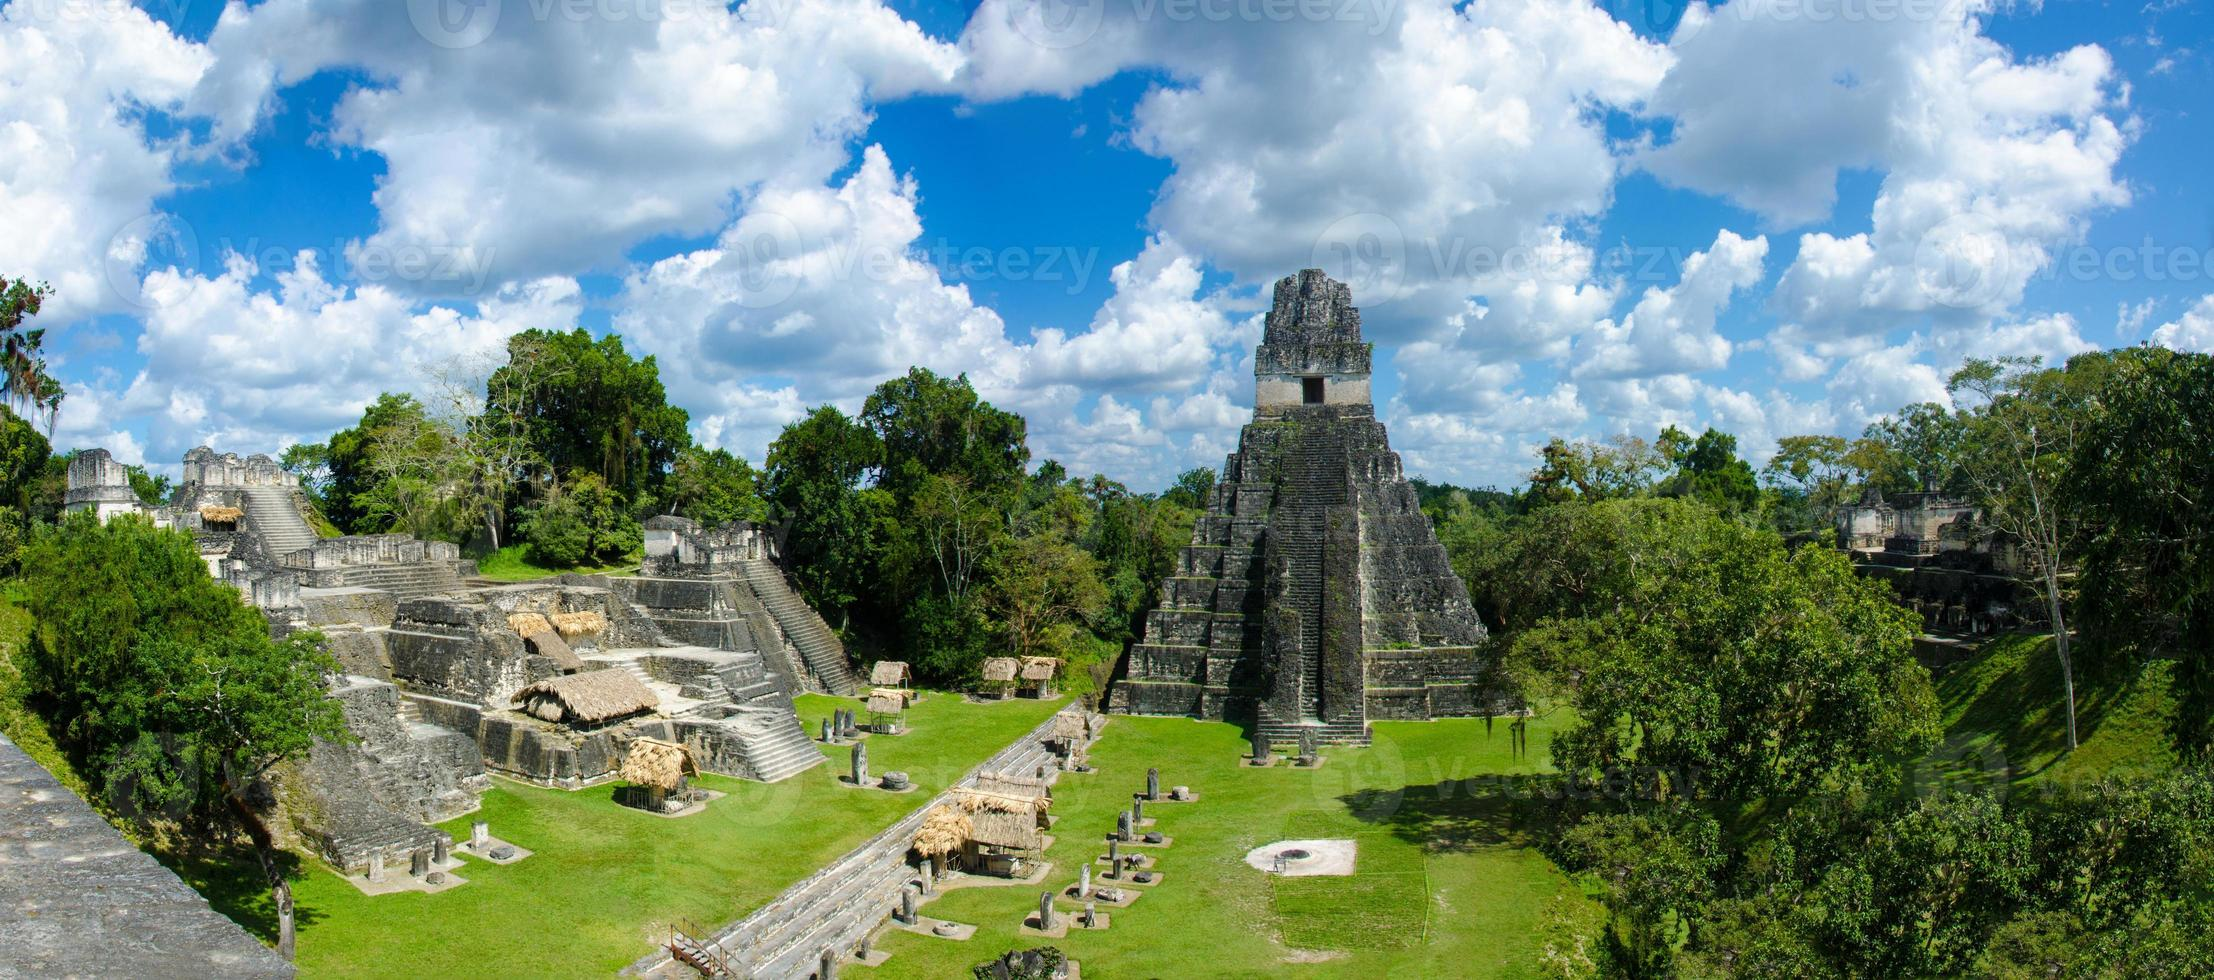 Panorama Tikal Ruinen und Pyramiden foto